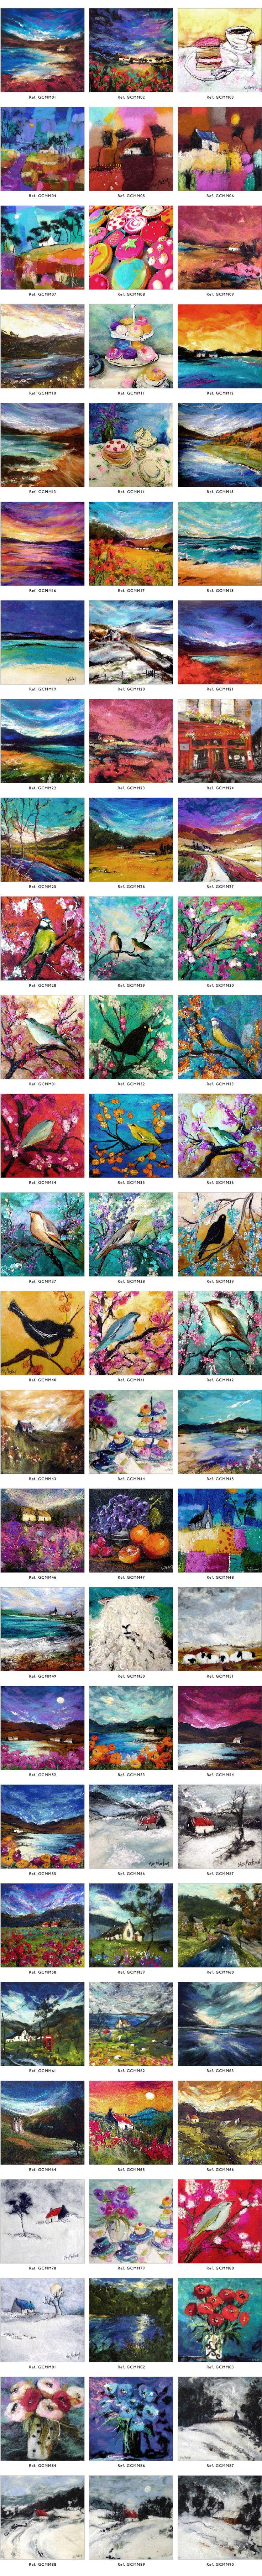 Moy Mackay Cards - Felt Painting